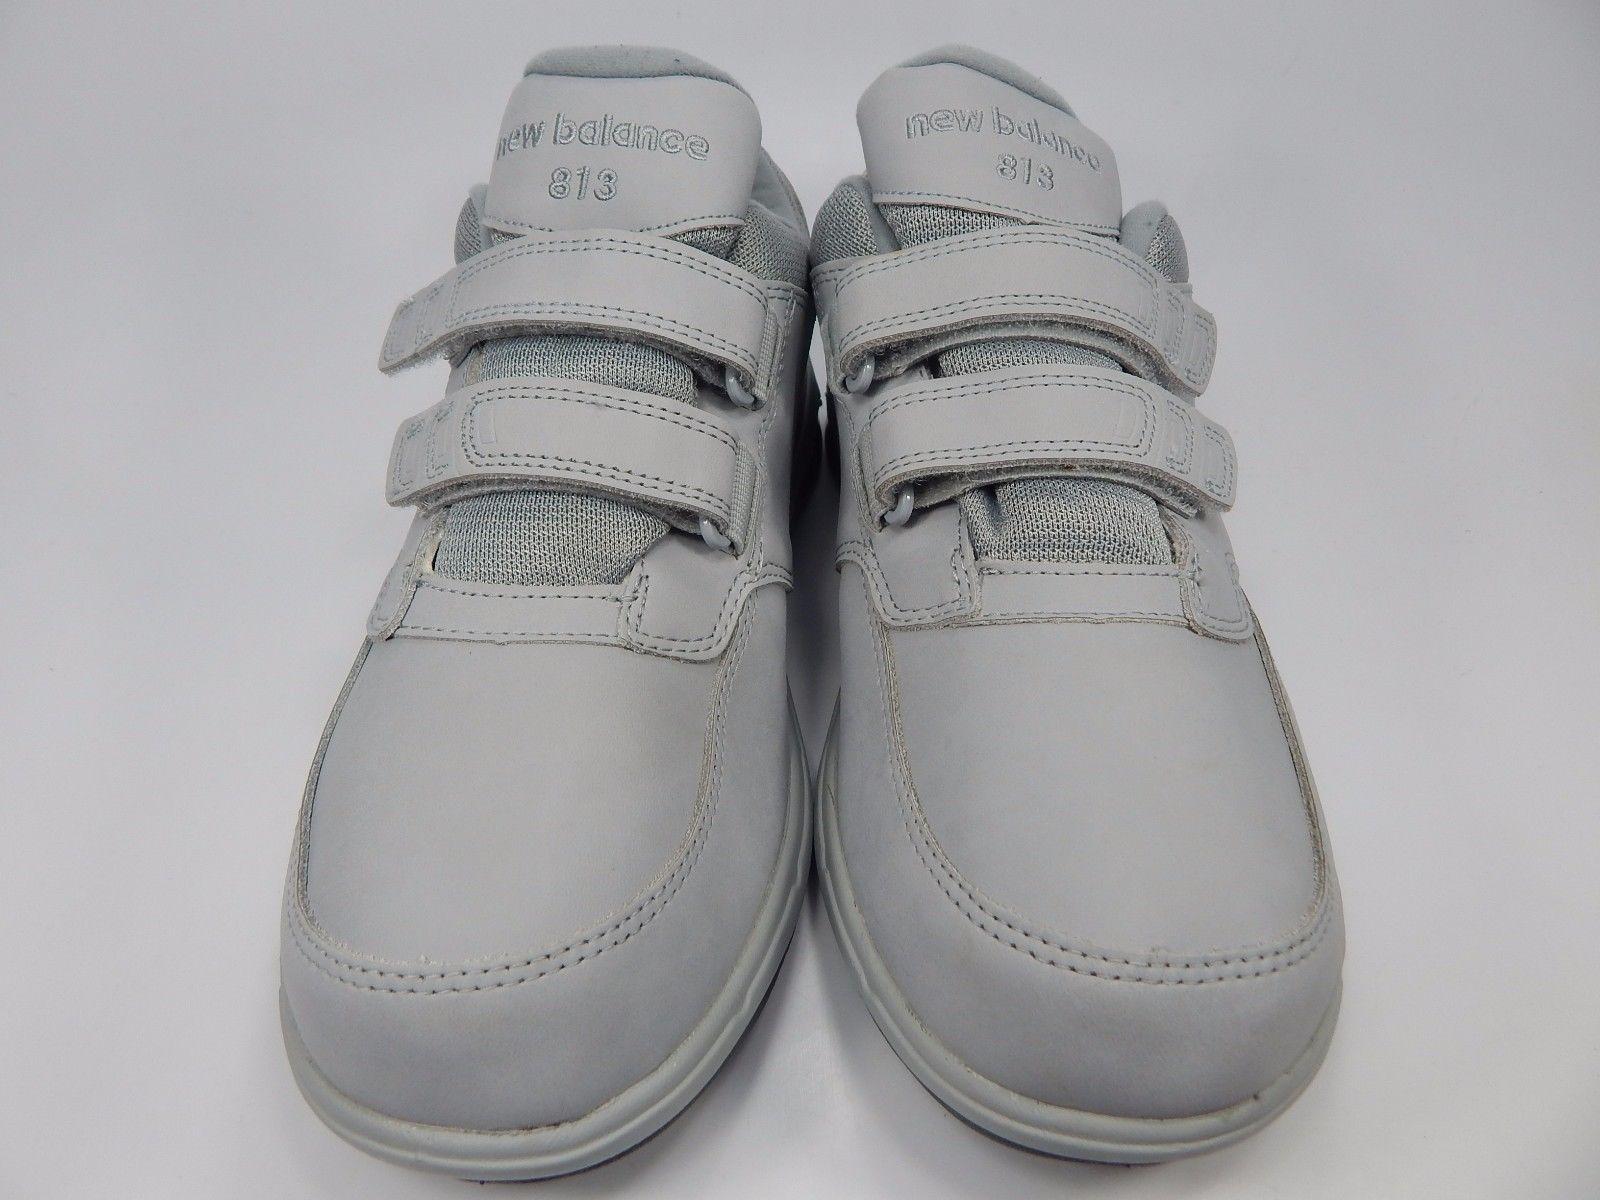 New Balance 813 Men's Walking Shoes Size US 9 M (D) EU 42.5 Gray MW813HGY